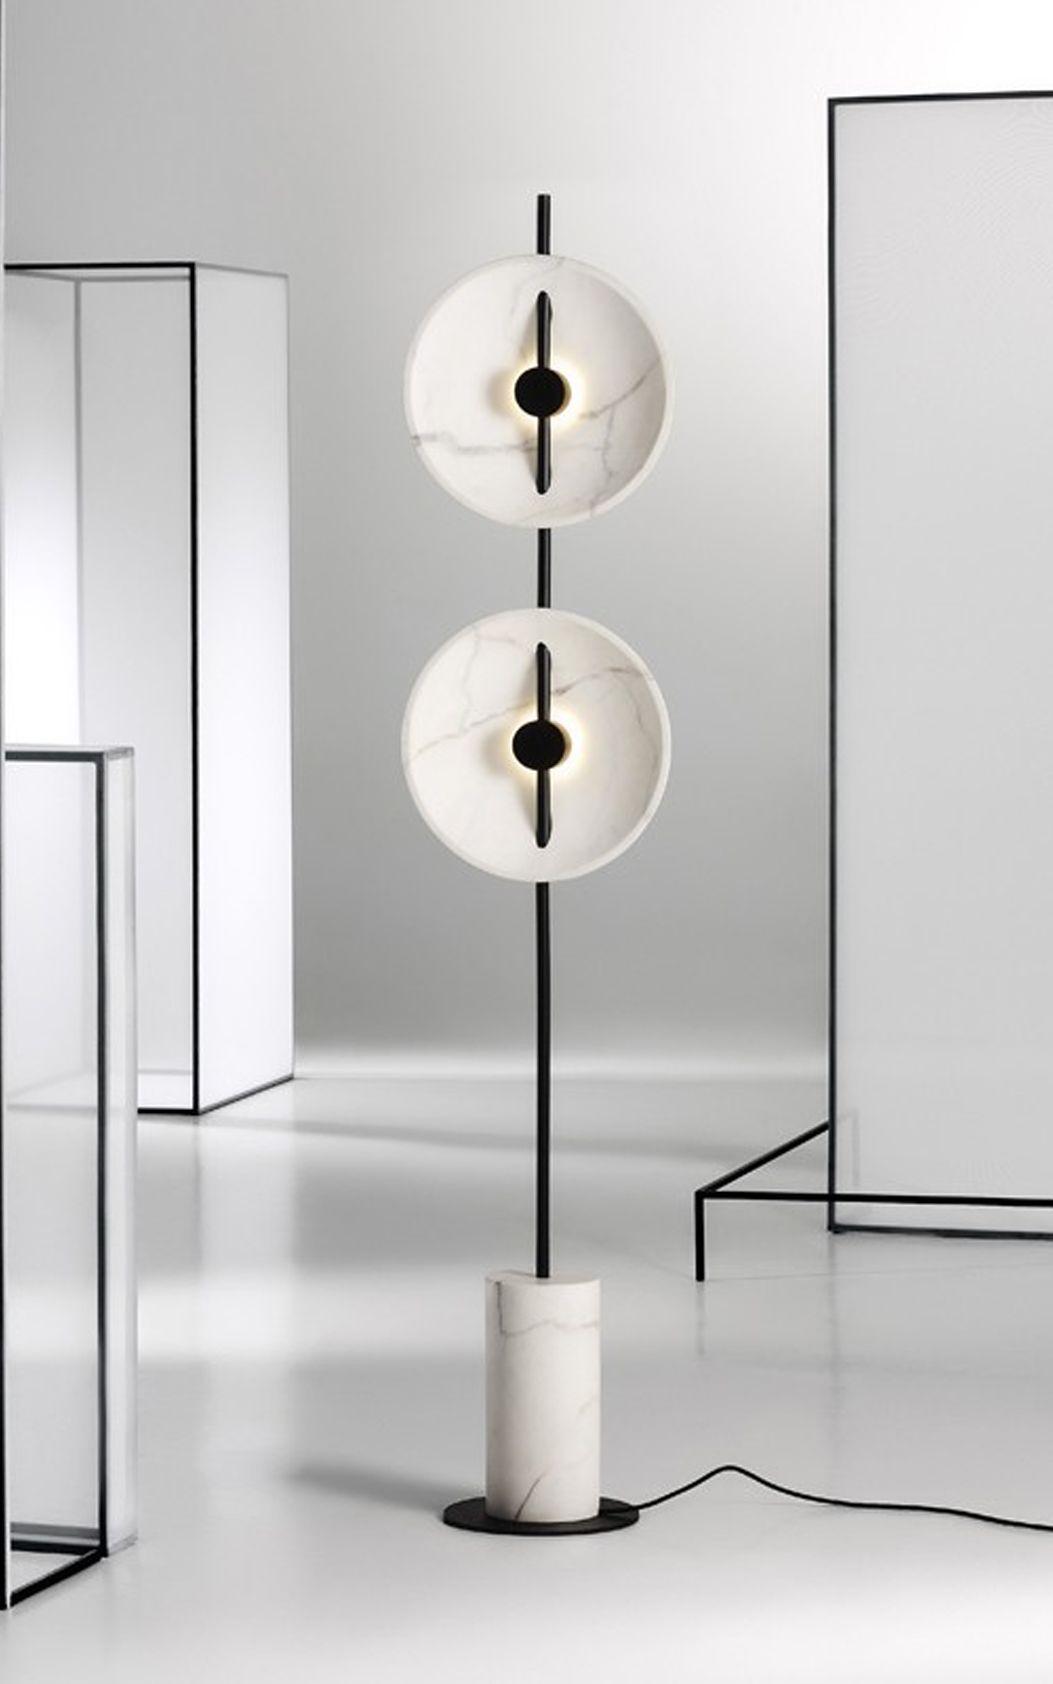 Mito Floor Lamp Rakumba Cool Floor Lamps Modern Floor Lamps Contemporary Interior